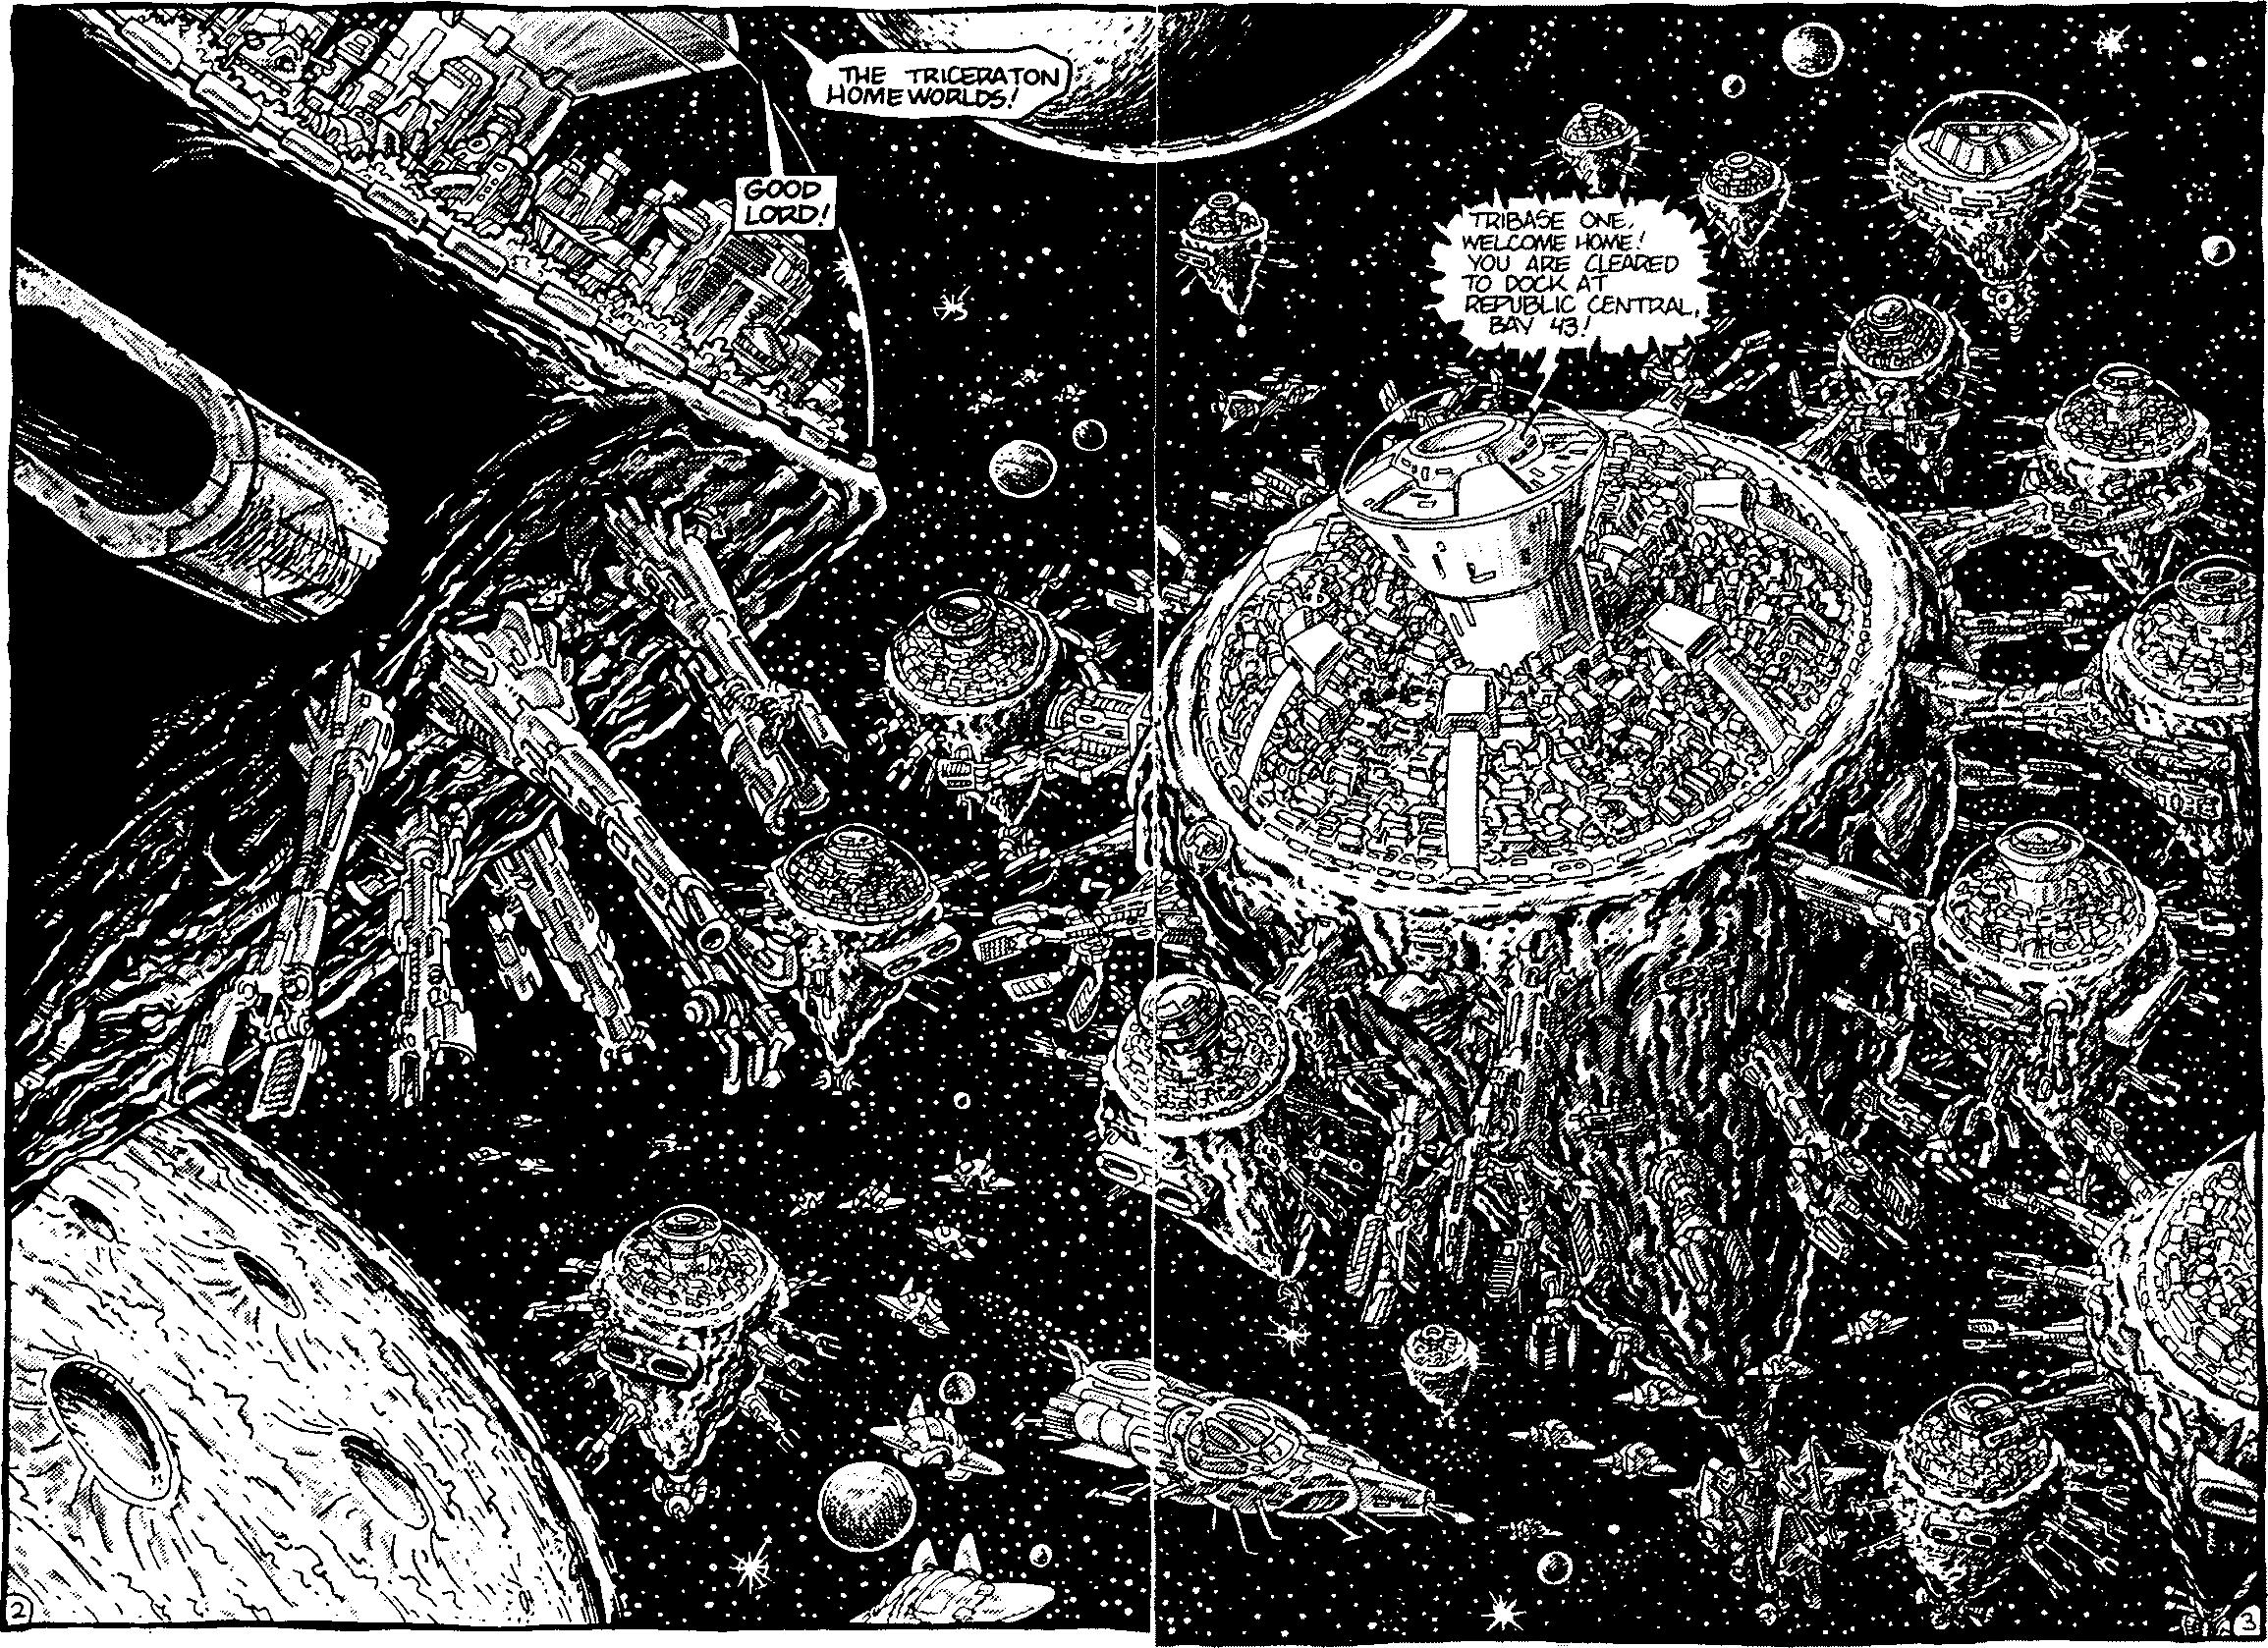 Triceraton Homeworlds (Mirage)